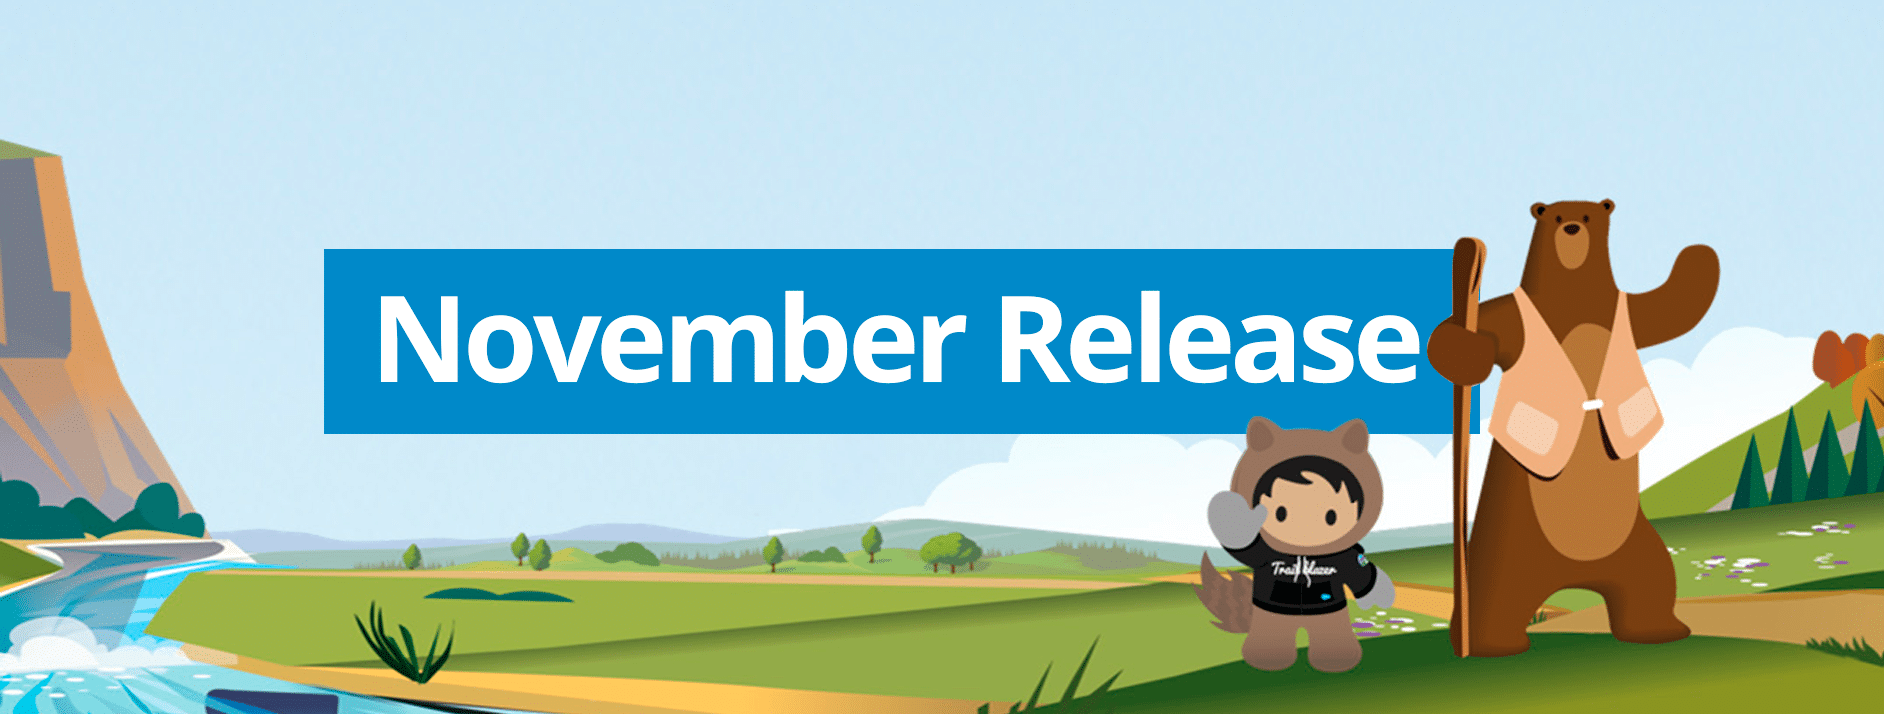 11. Release November 2020